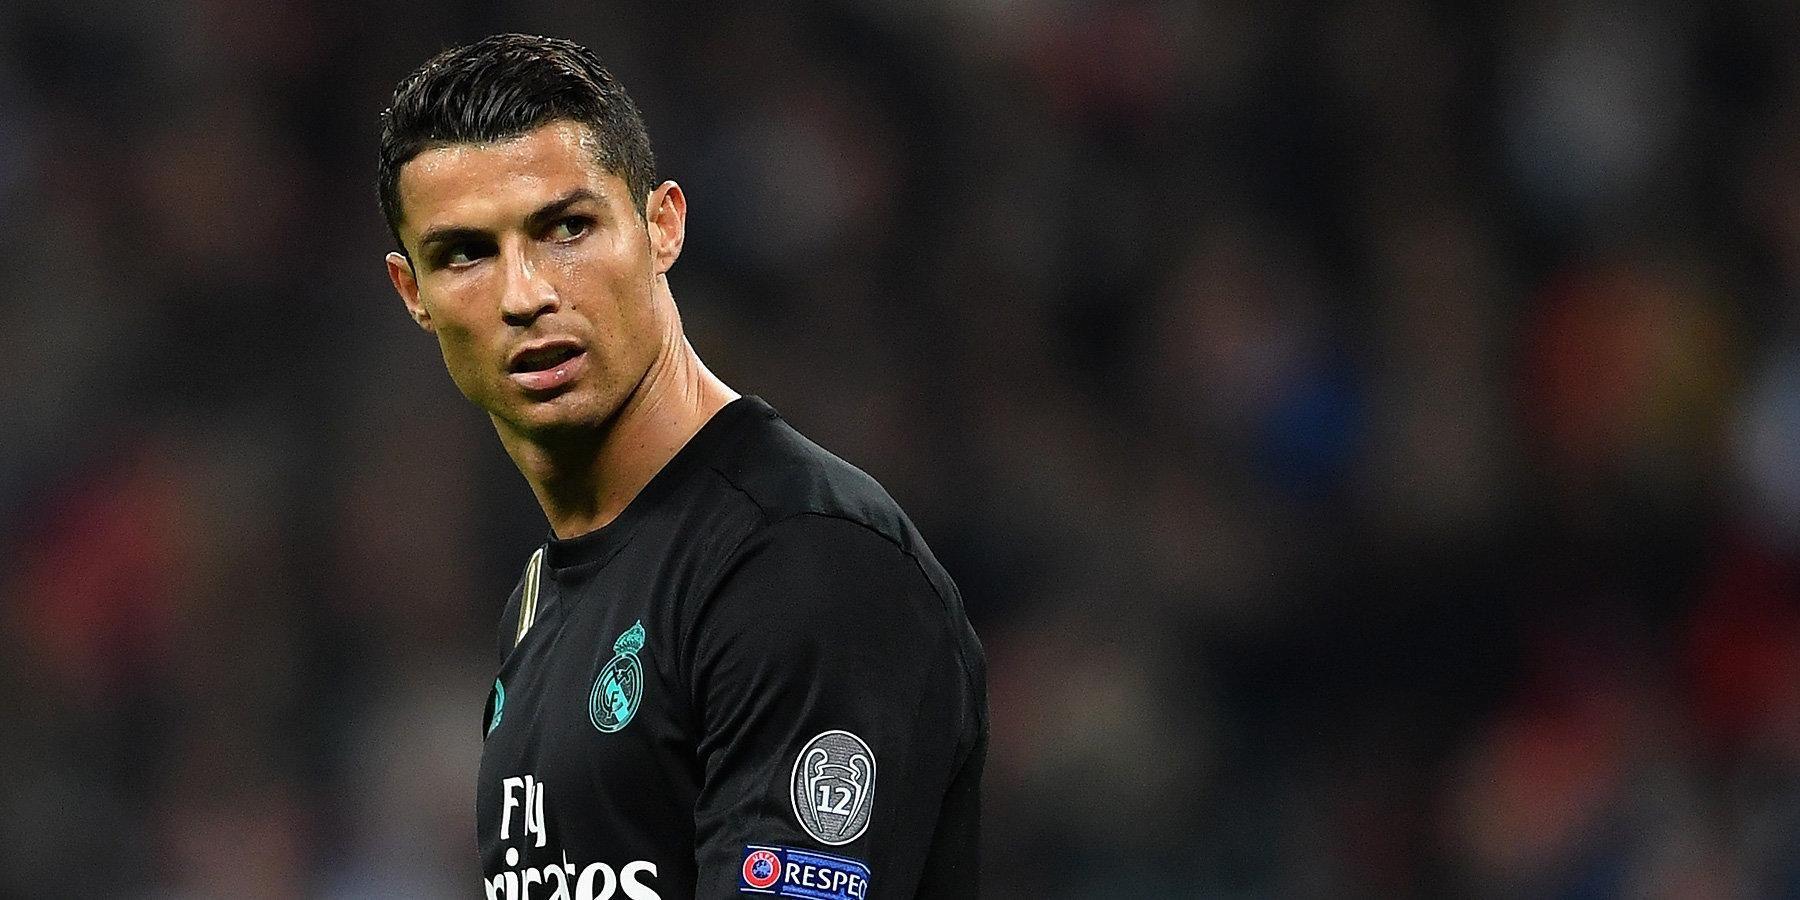 Клаусула Де Хеа составляет 60 млн евро — Marca